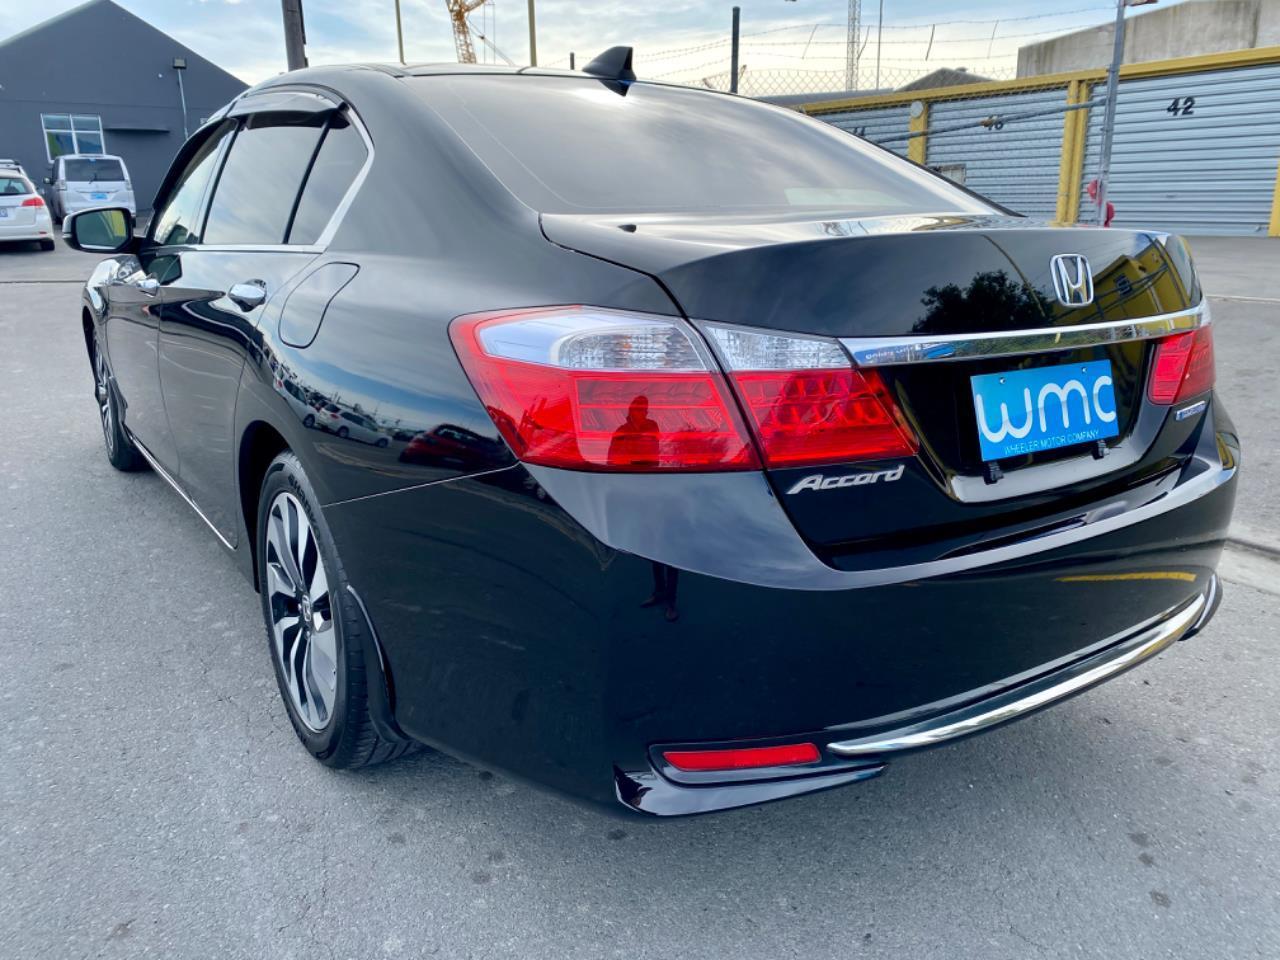 image-4, 2013 Honda Accord Hybrid 'LX' at Christchurch